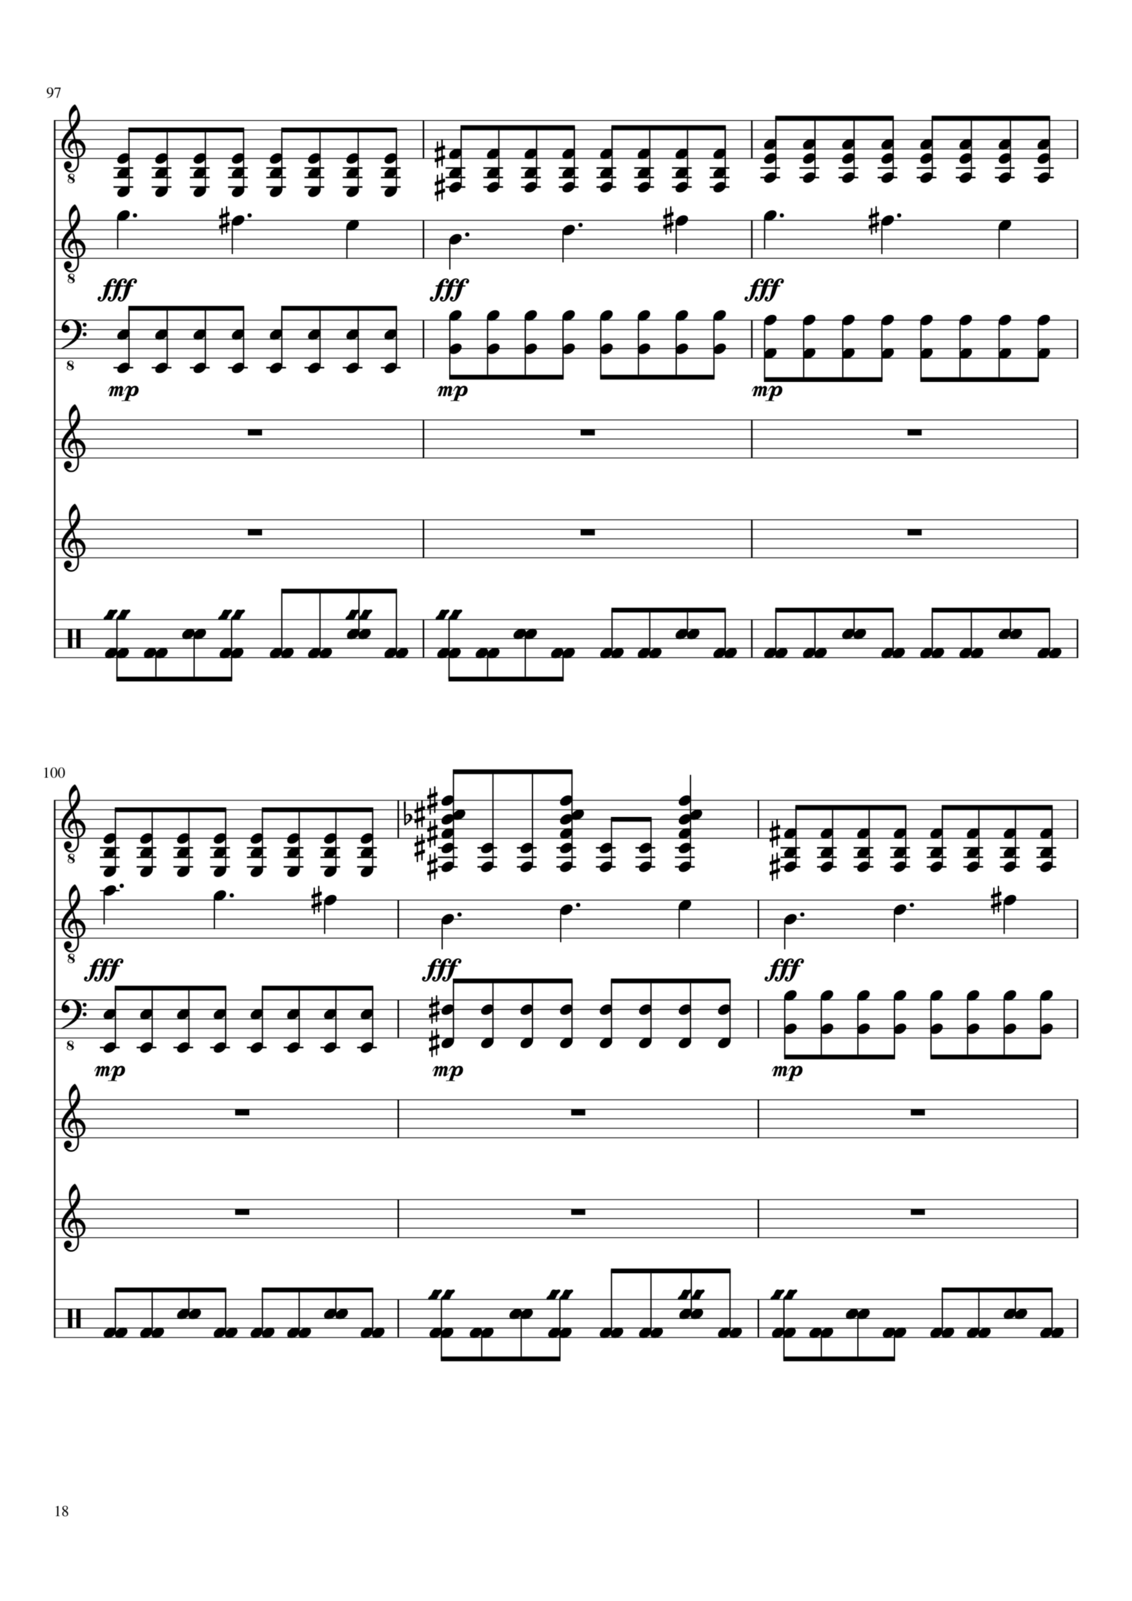 Ot Bolshogo Uma slide, Image 18